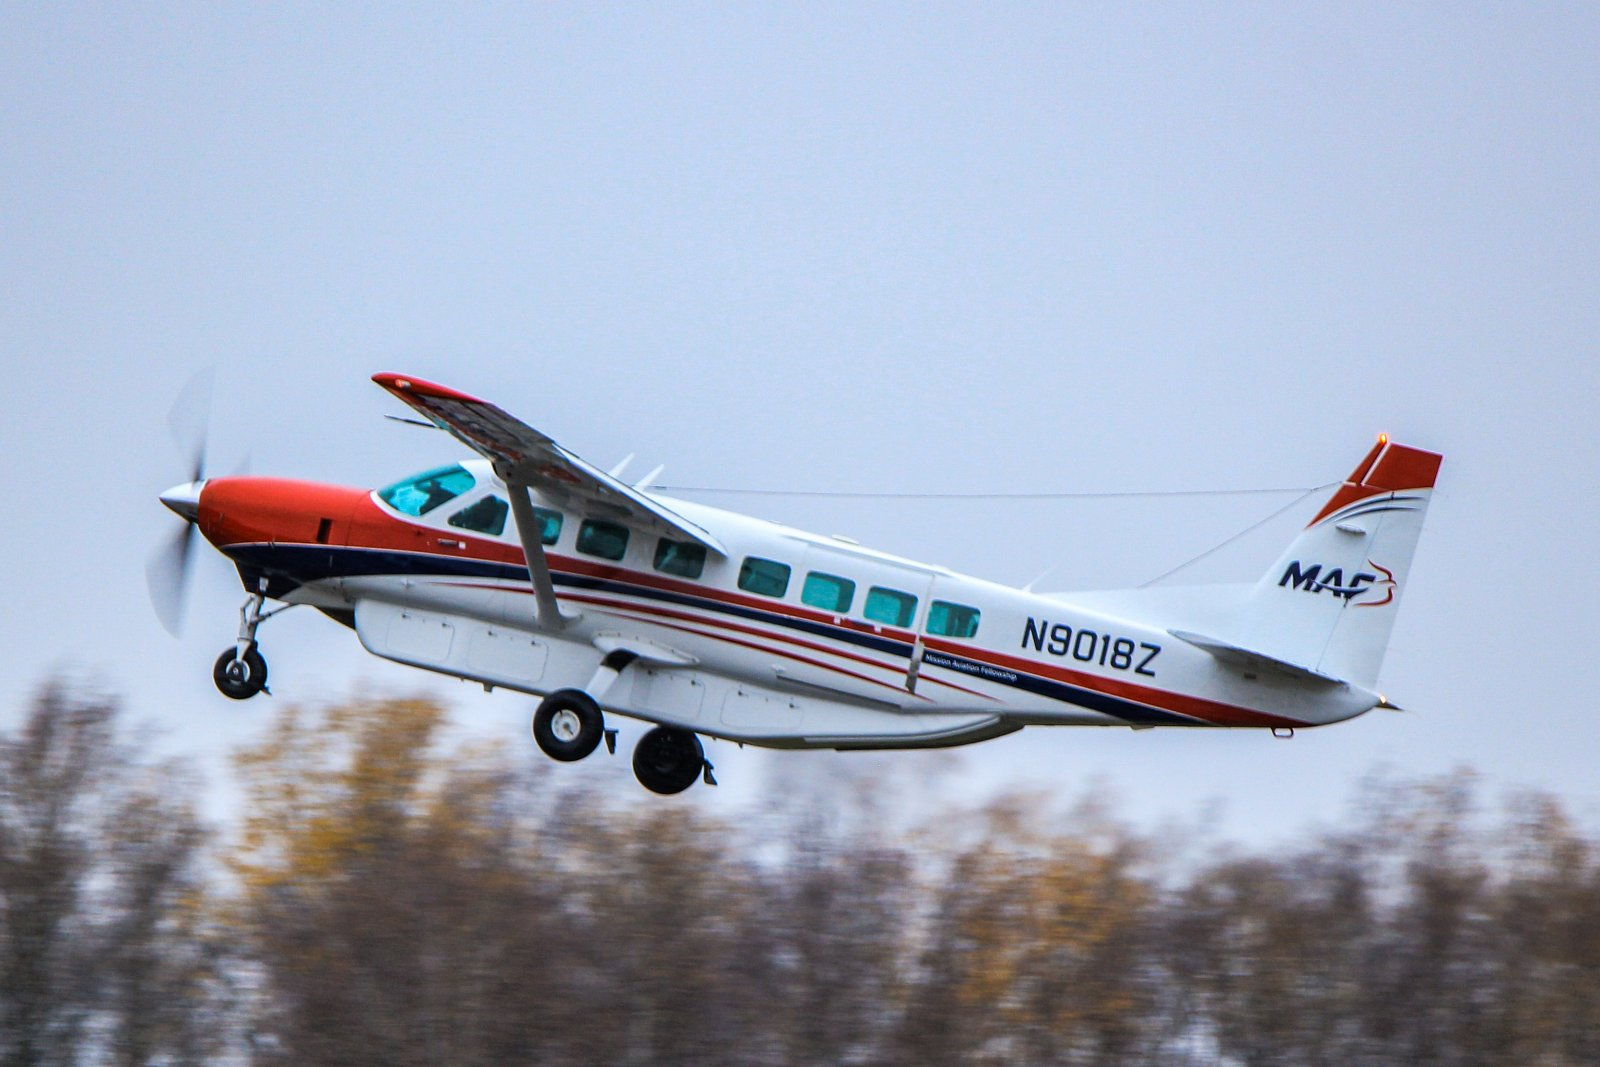 N9018Z tekemässä ylilentoa Malmilla